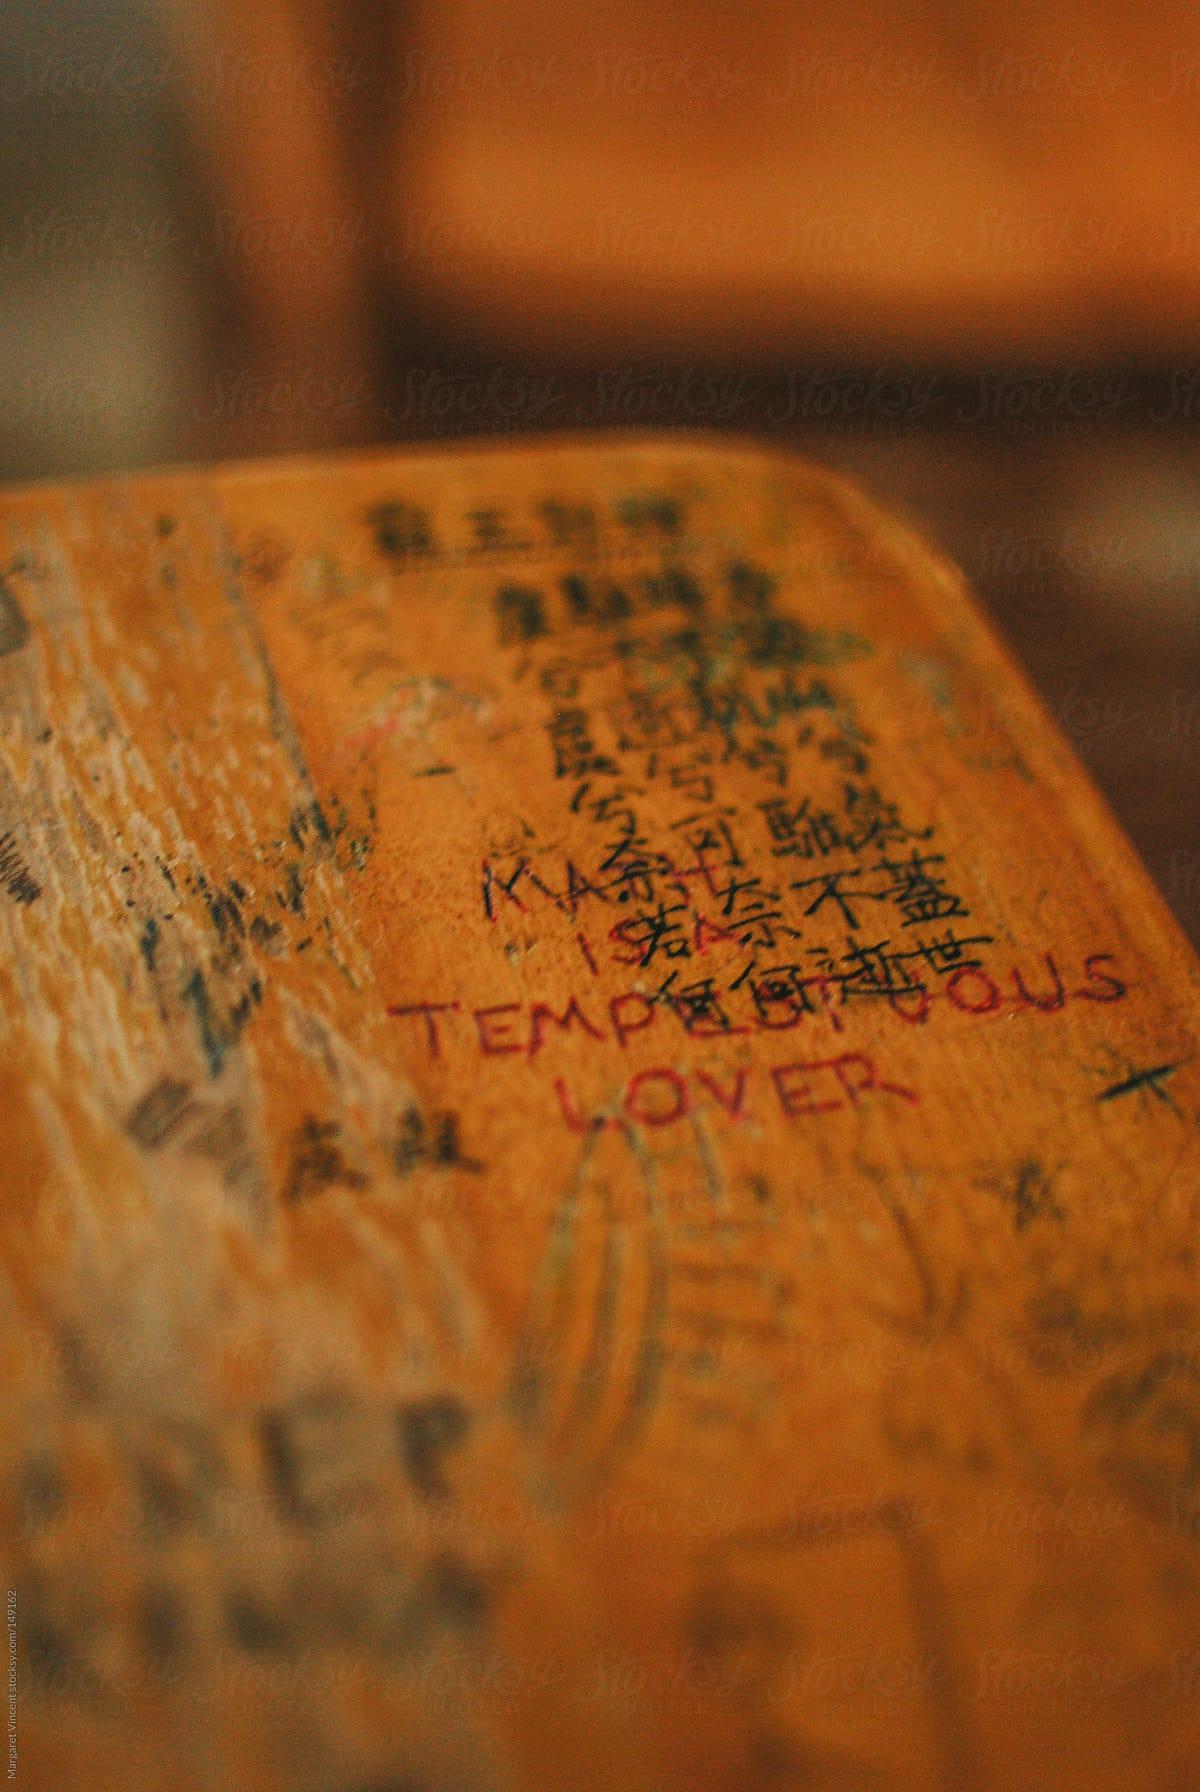 graffiti scratched into school desk top by Margaret Vincent ...